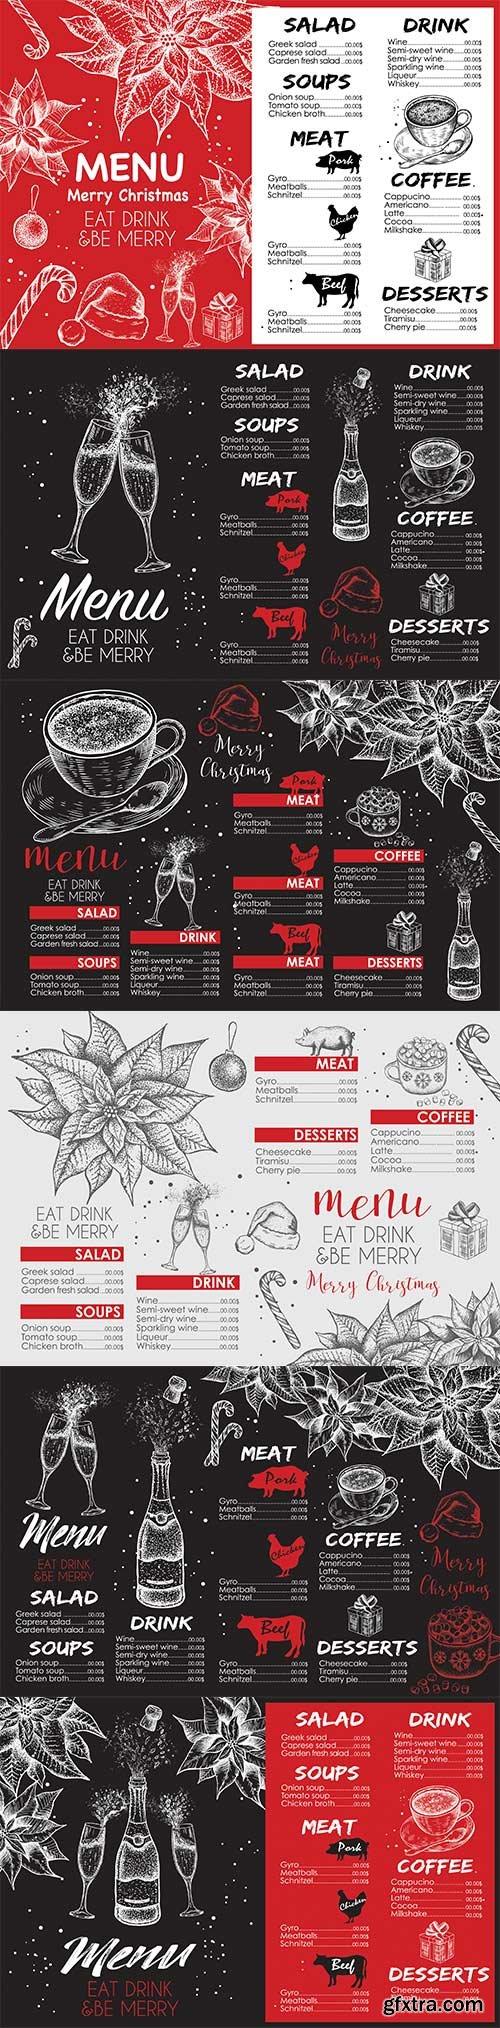 Merry Christmas menu, design vector template